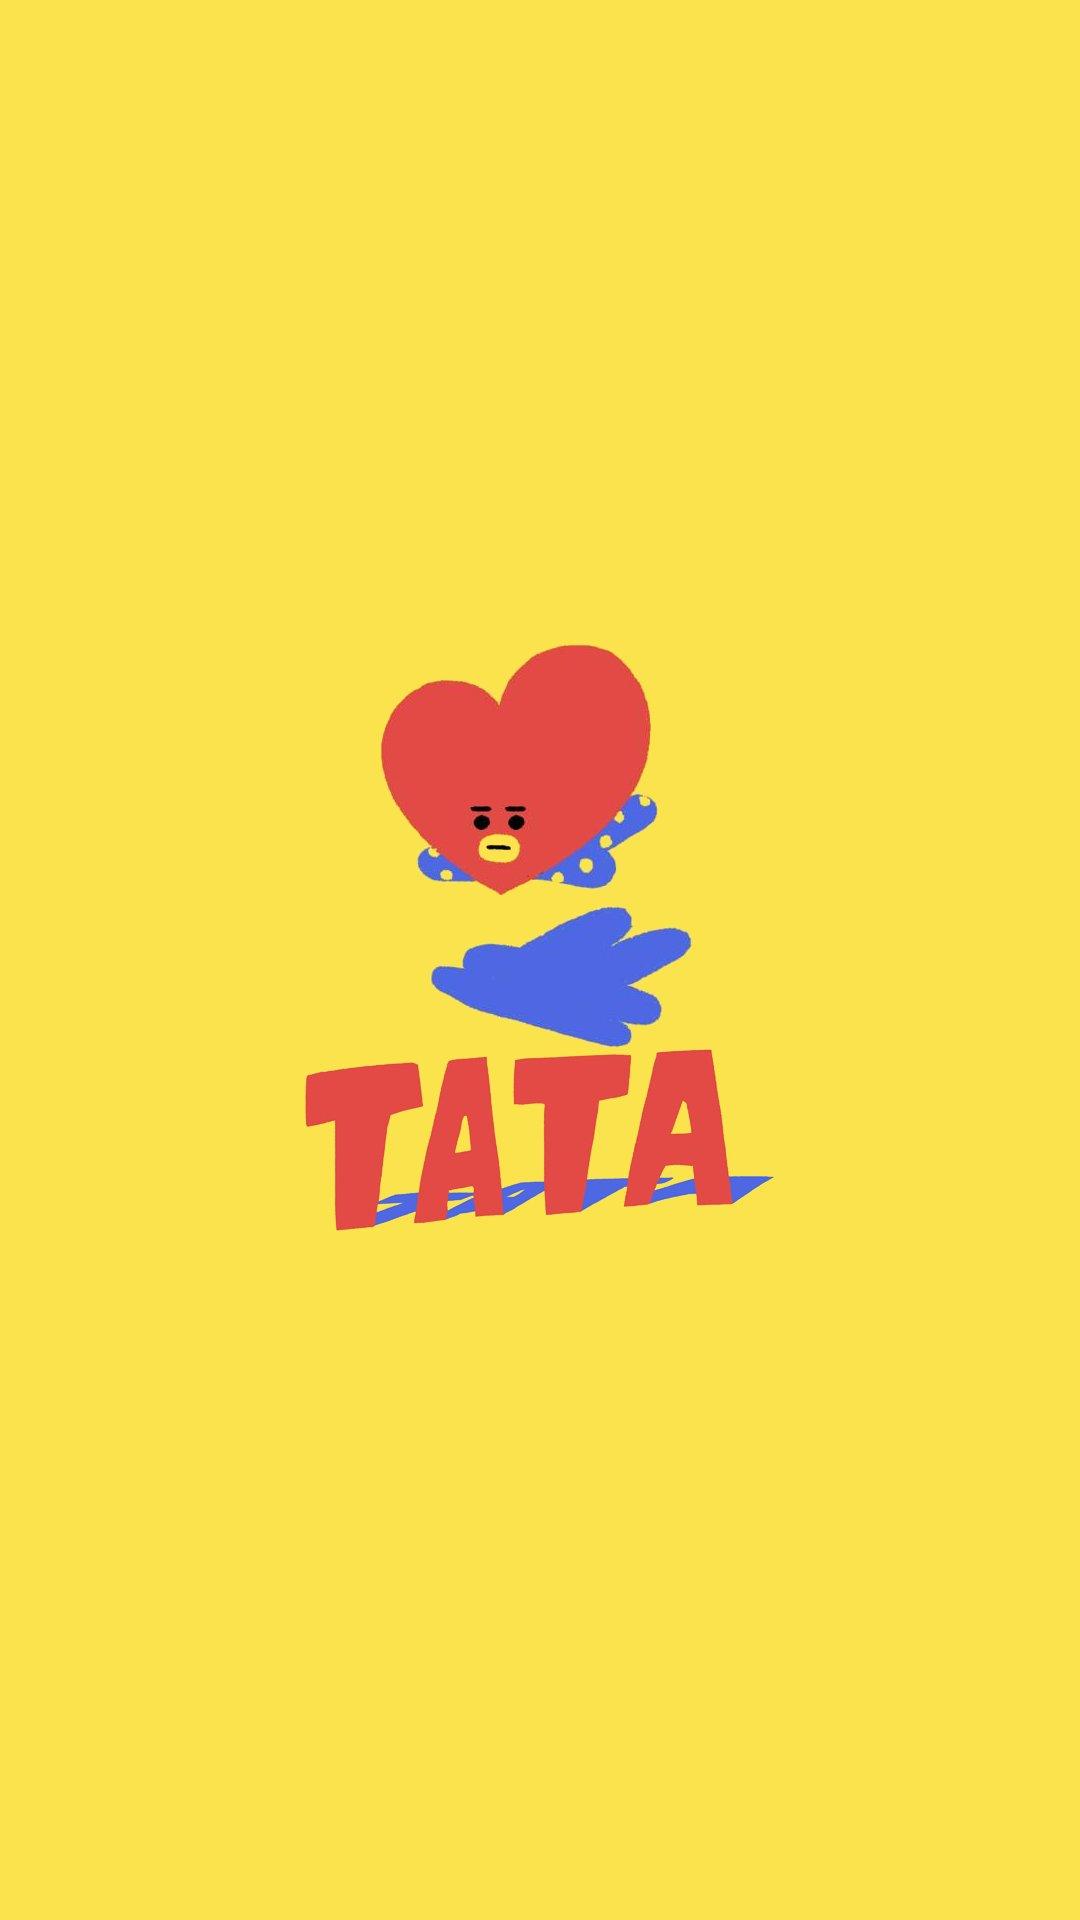 fafis on twitter quotphone wallpaper tata bt21